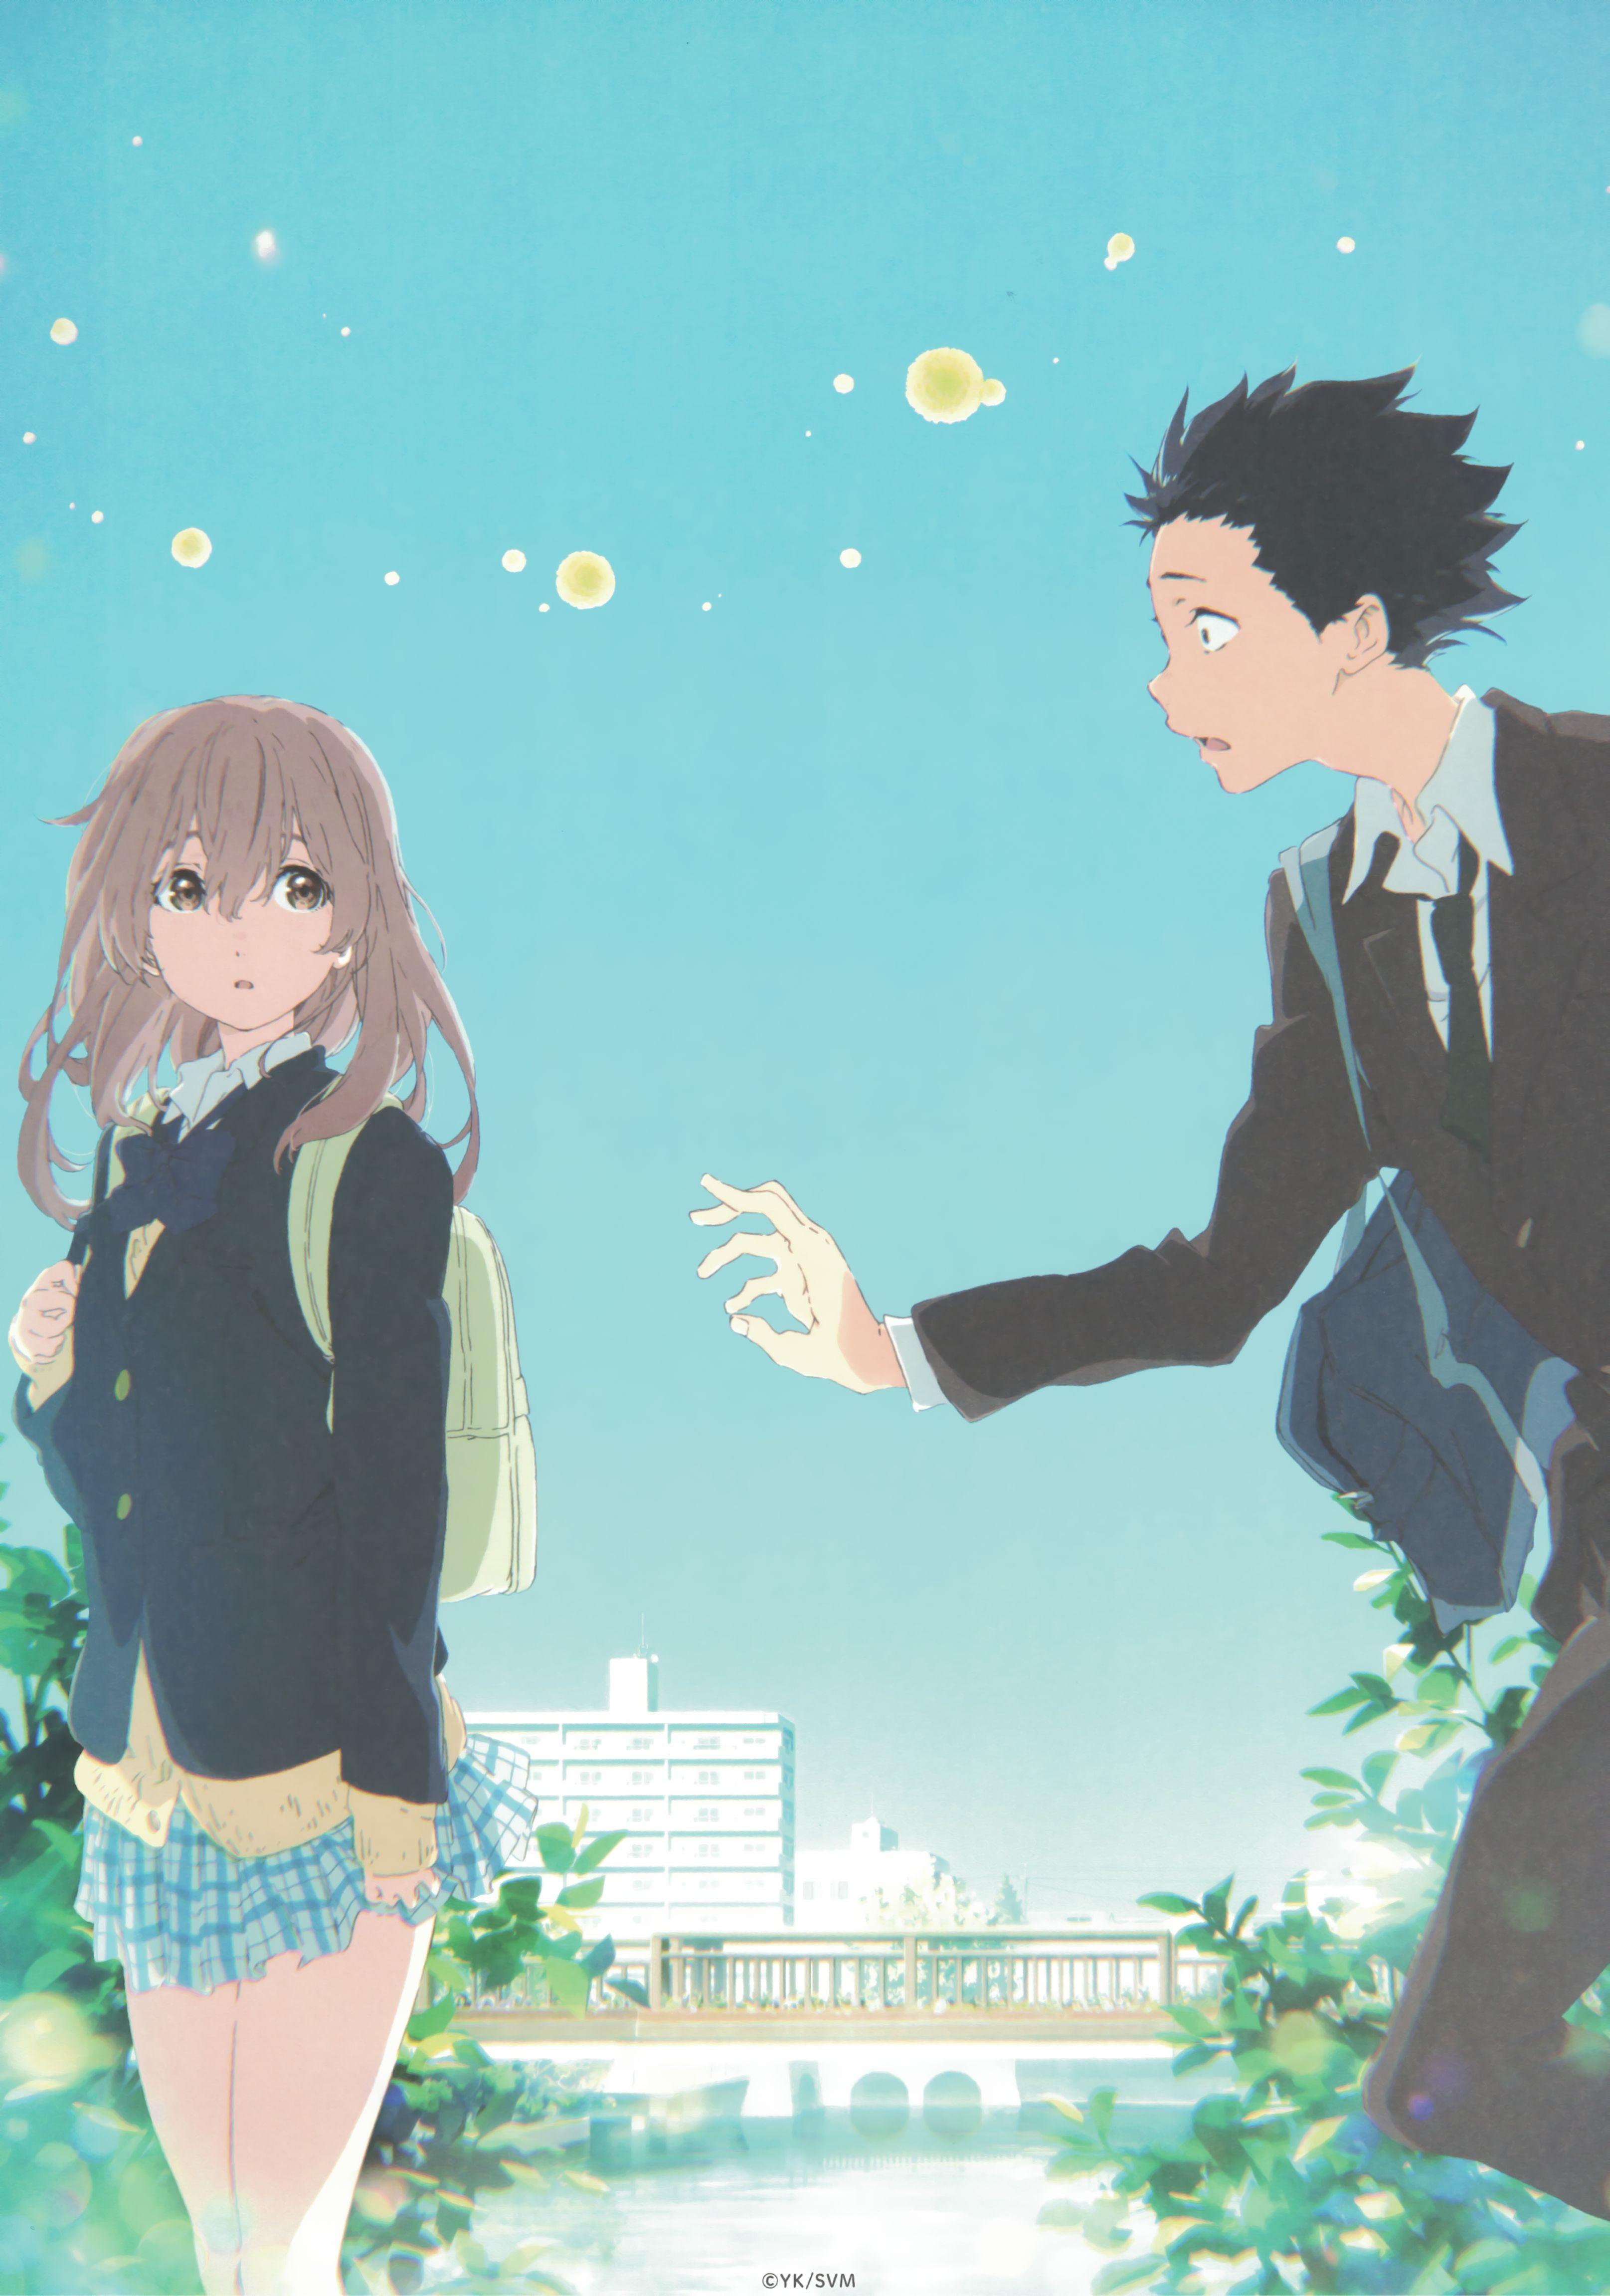 Anime image by K♥ on Koe No Katachi